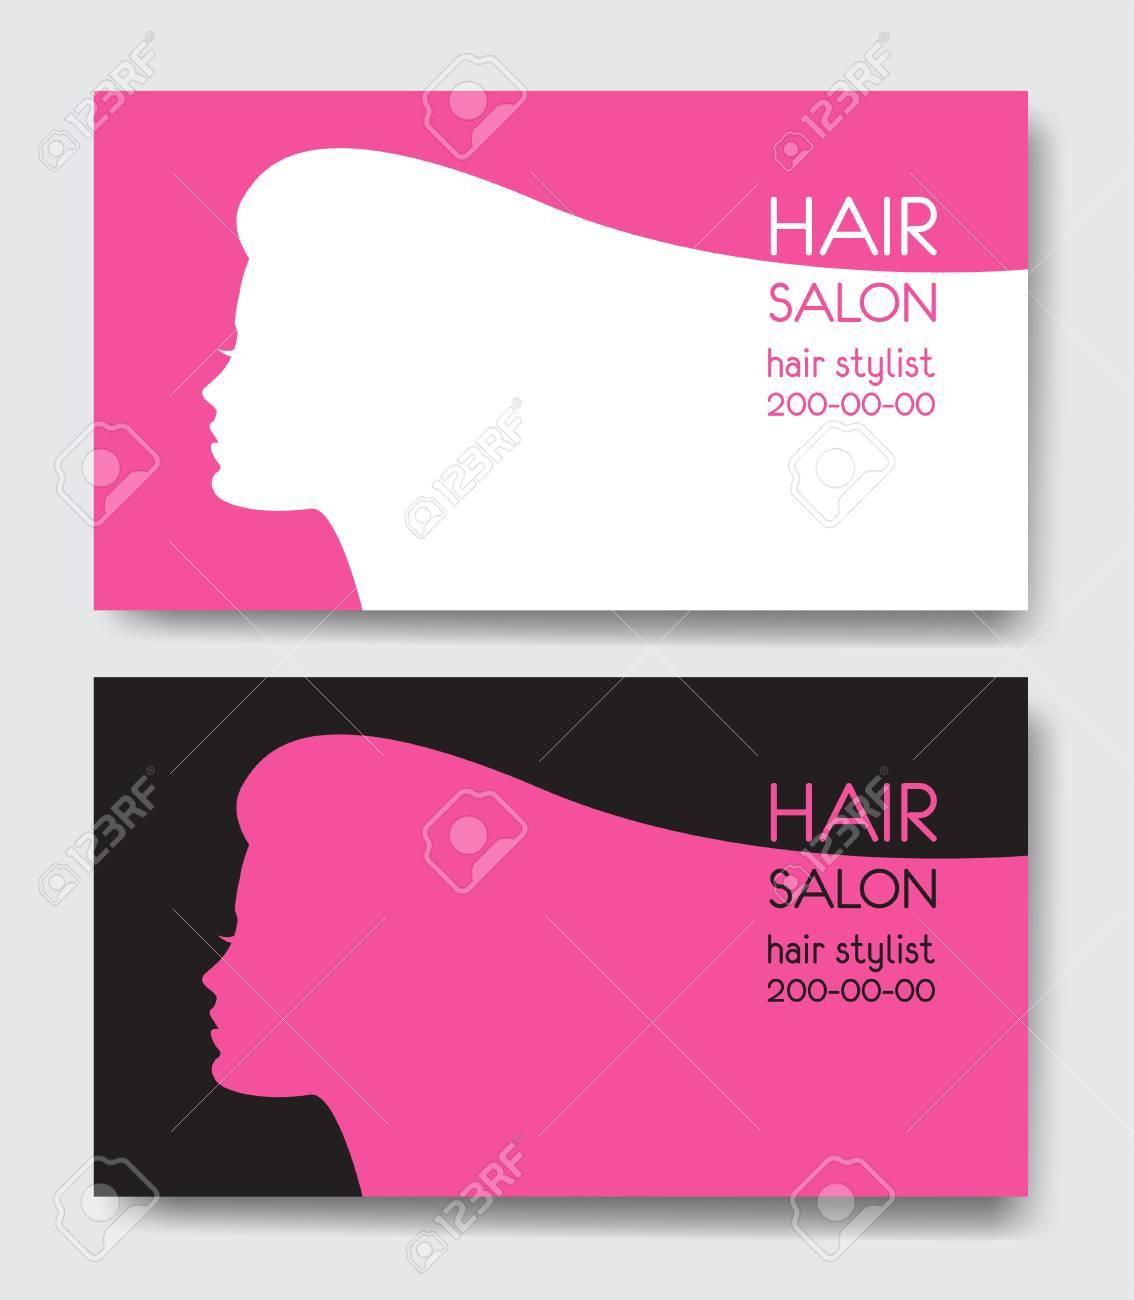 Hair salon business card templates royalty free cliparts vectors hair salon business card templates stock vector 76498015 fbccfo Gallery